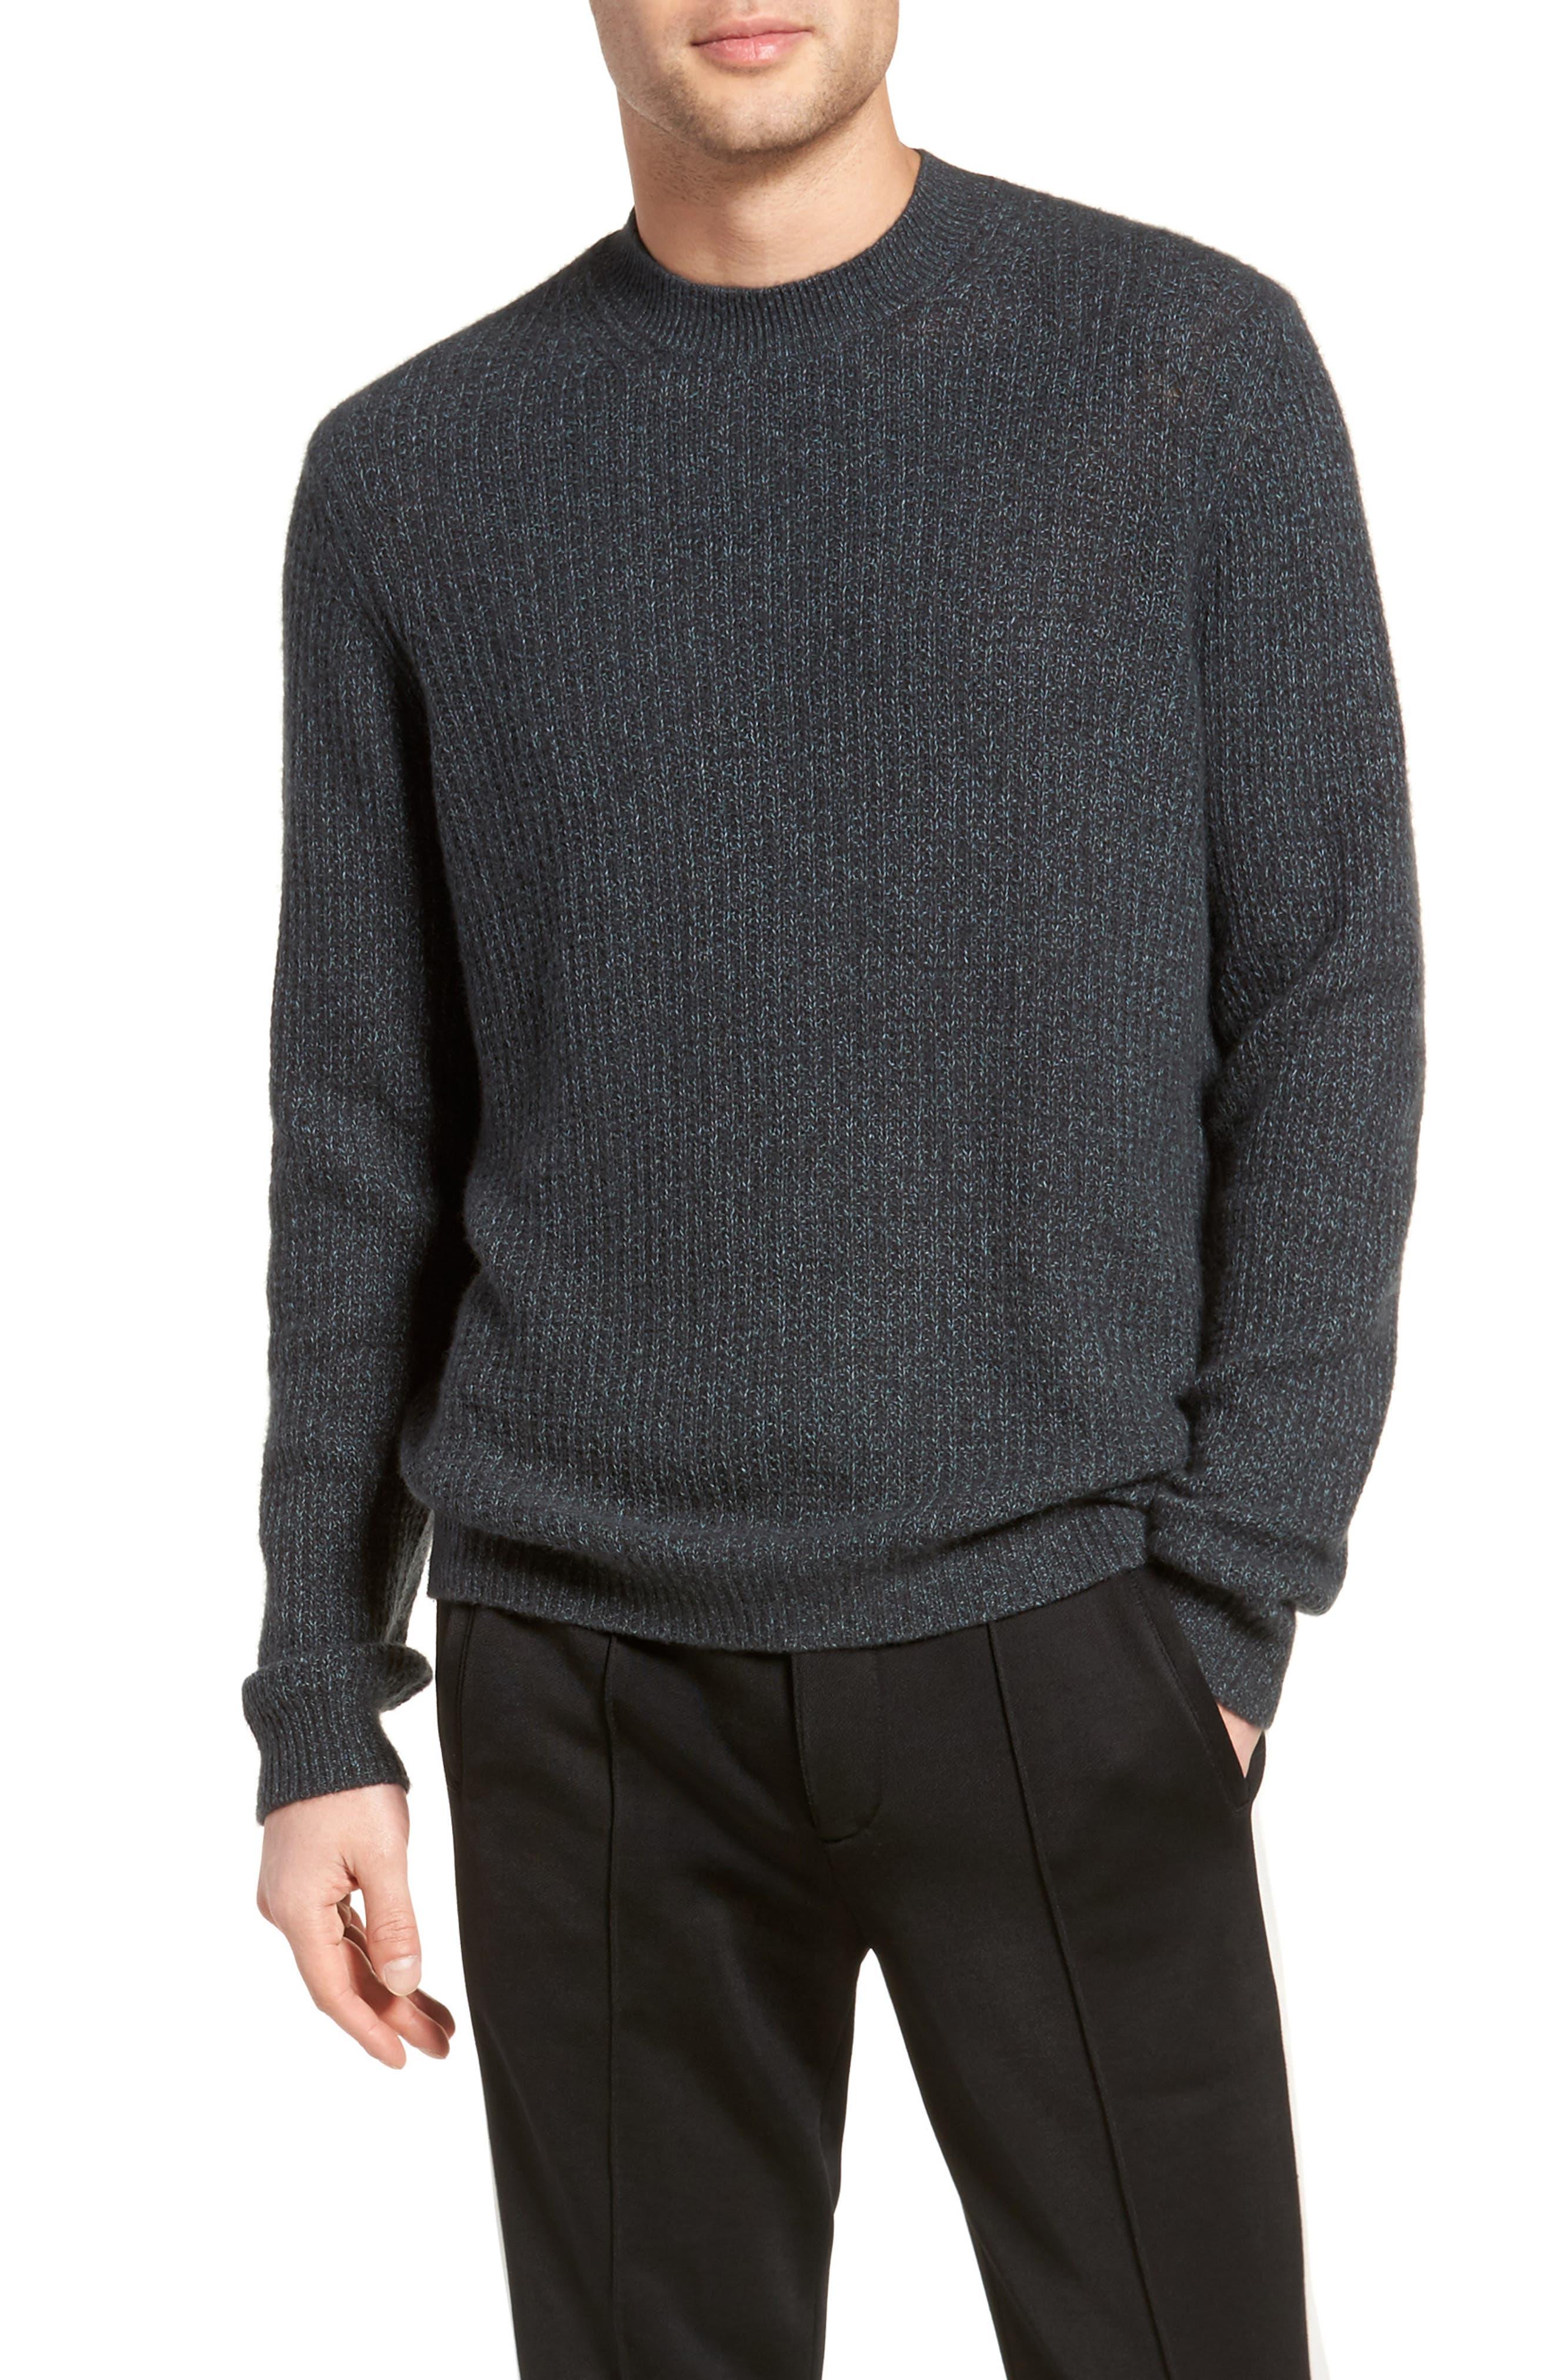 Thermal Knit Crewneck Cashmere Sweater,                             Main thumbnail 1, color,                             Beetle/ Mint